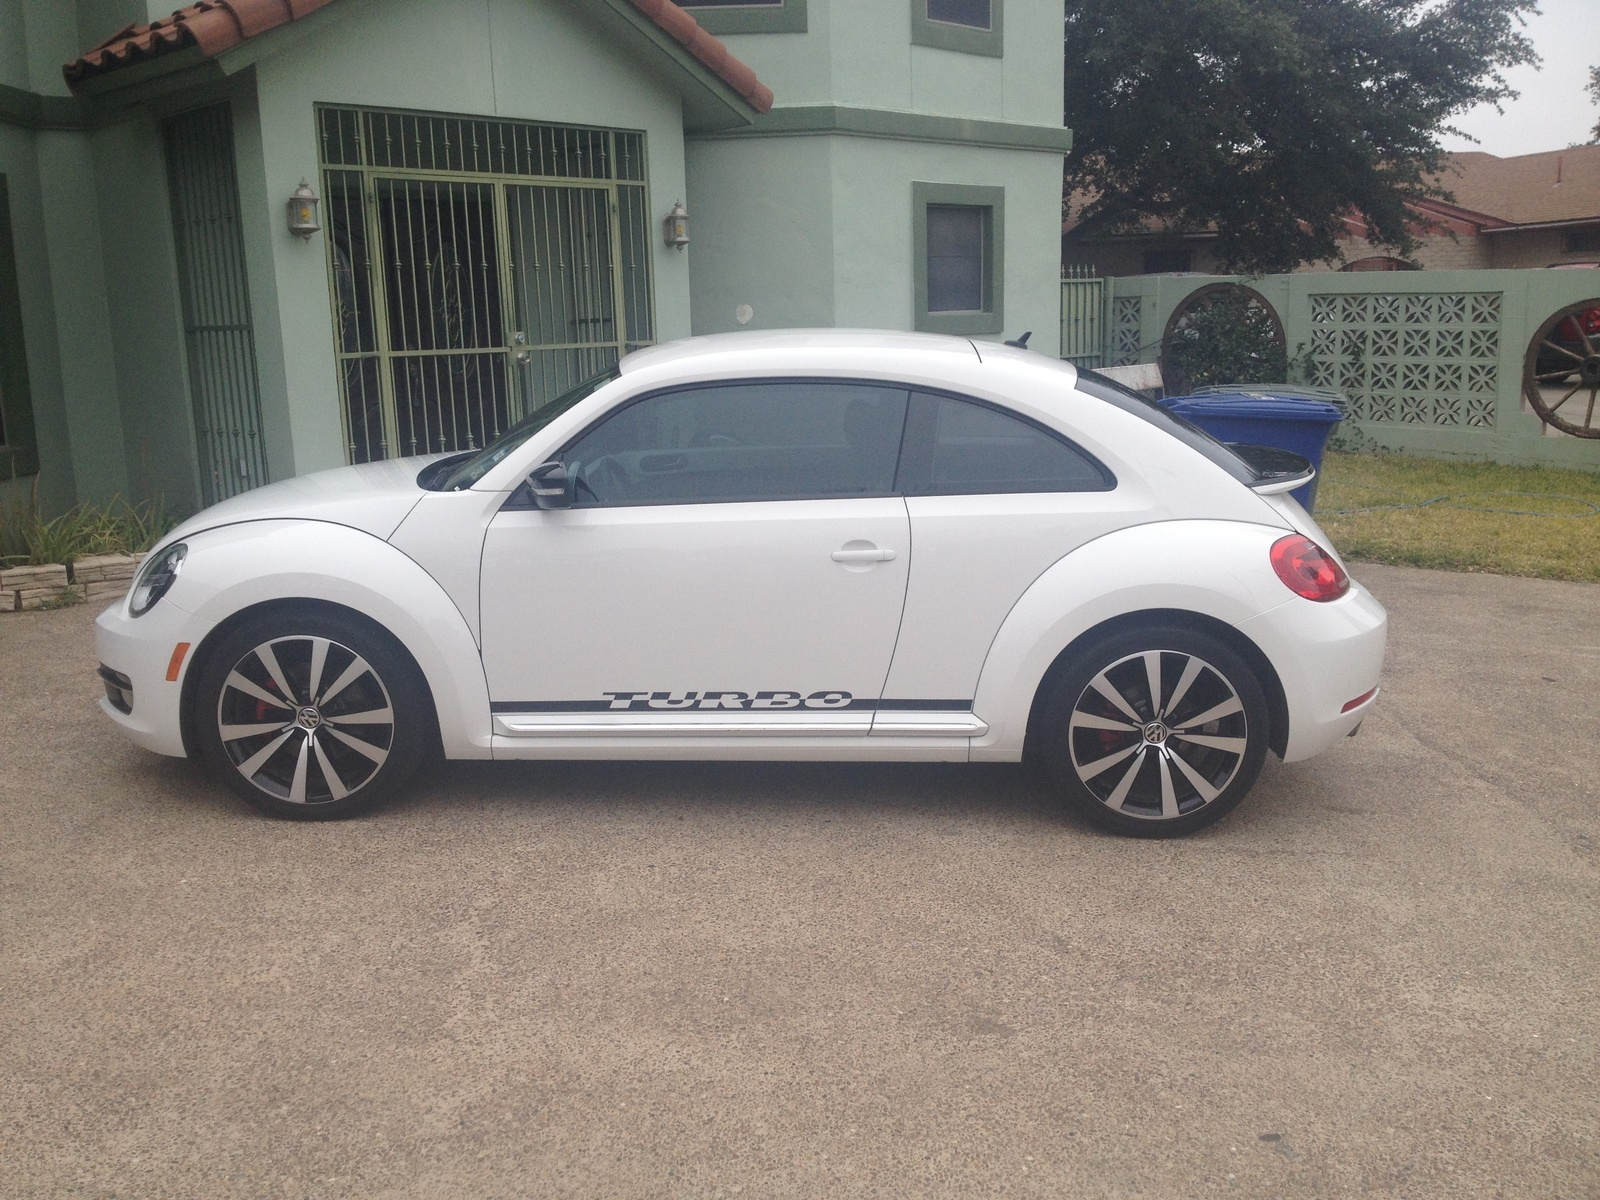 lw models model lws cgtrader car classic white obj lwo fbx max beetle standard volkswagen